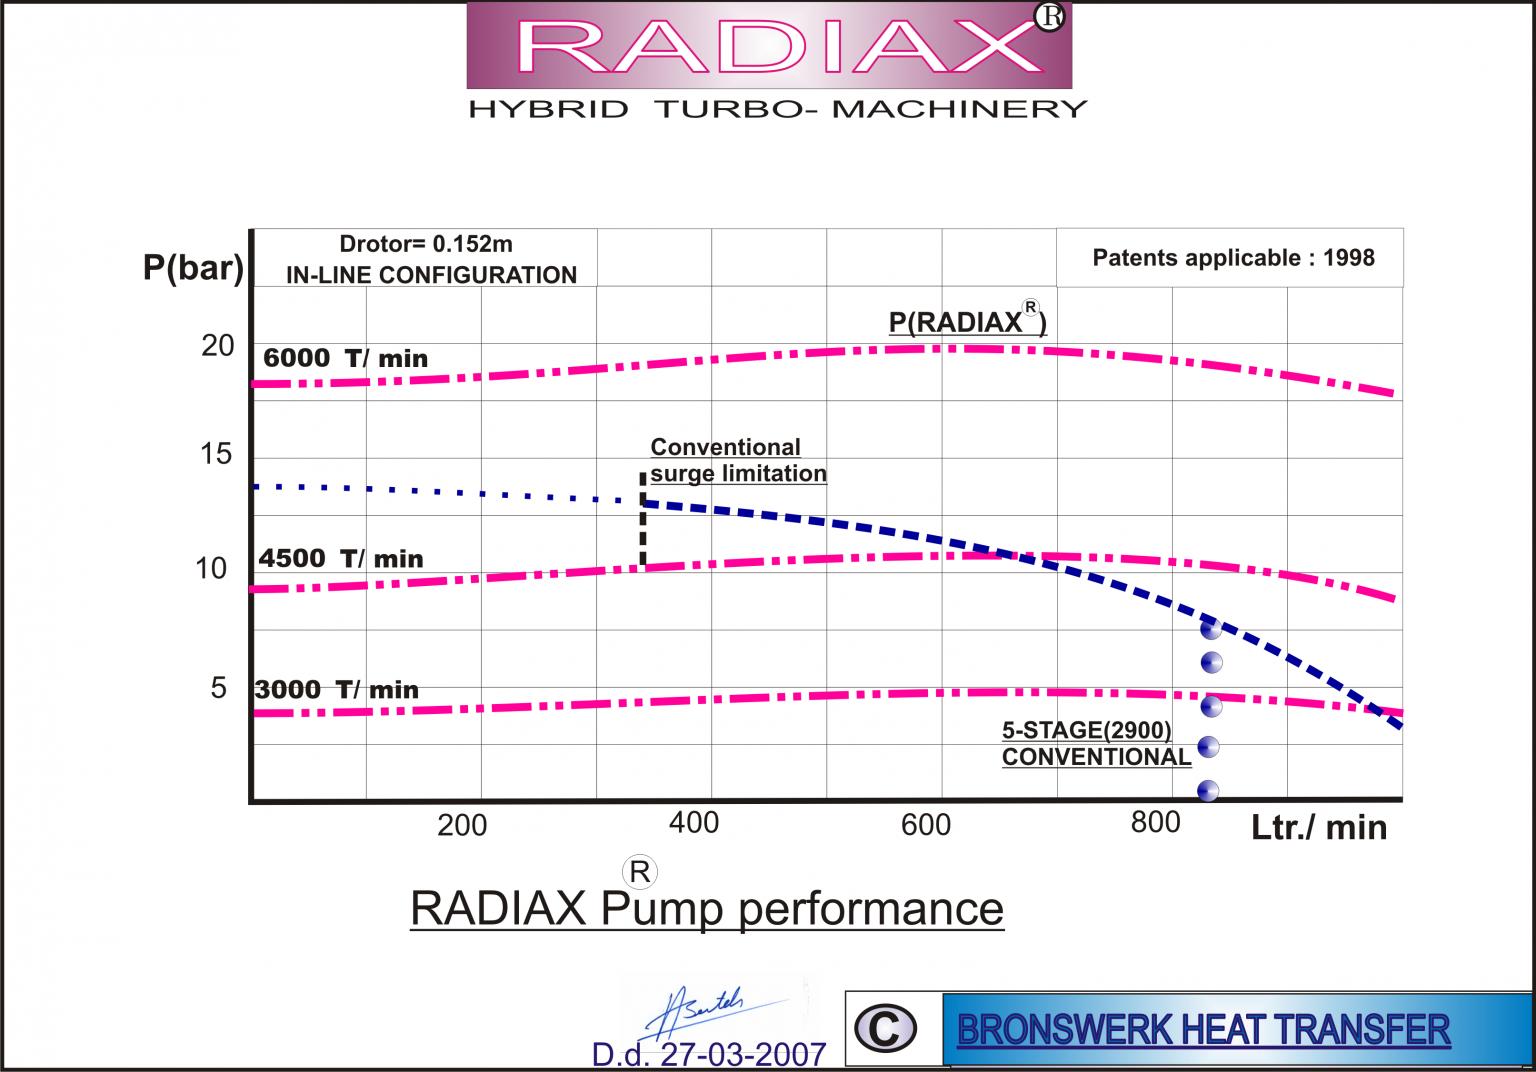 Radiax Pump performance